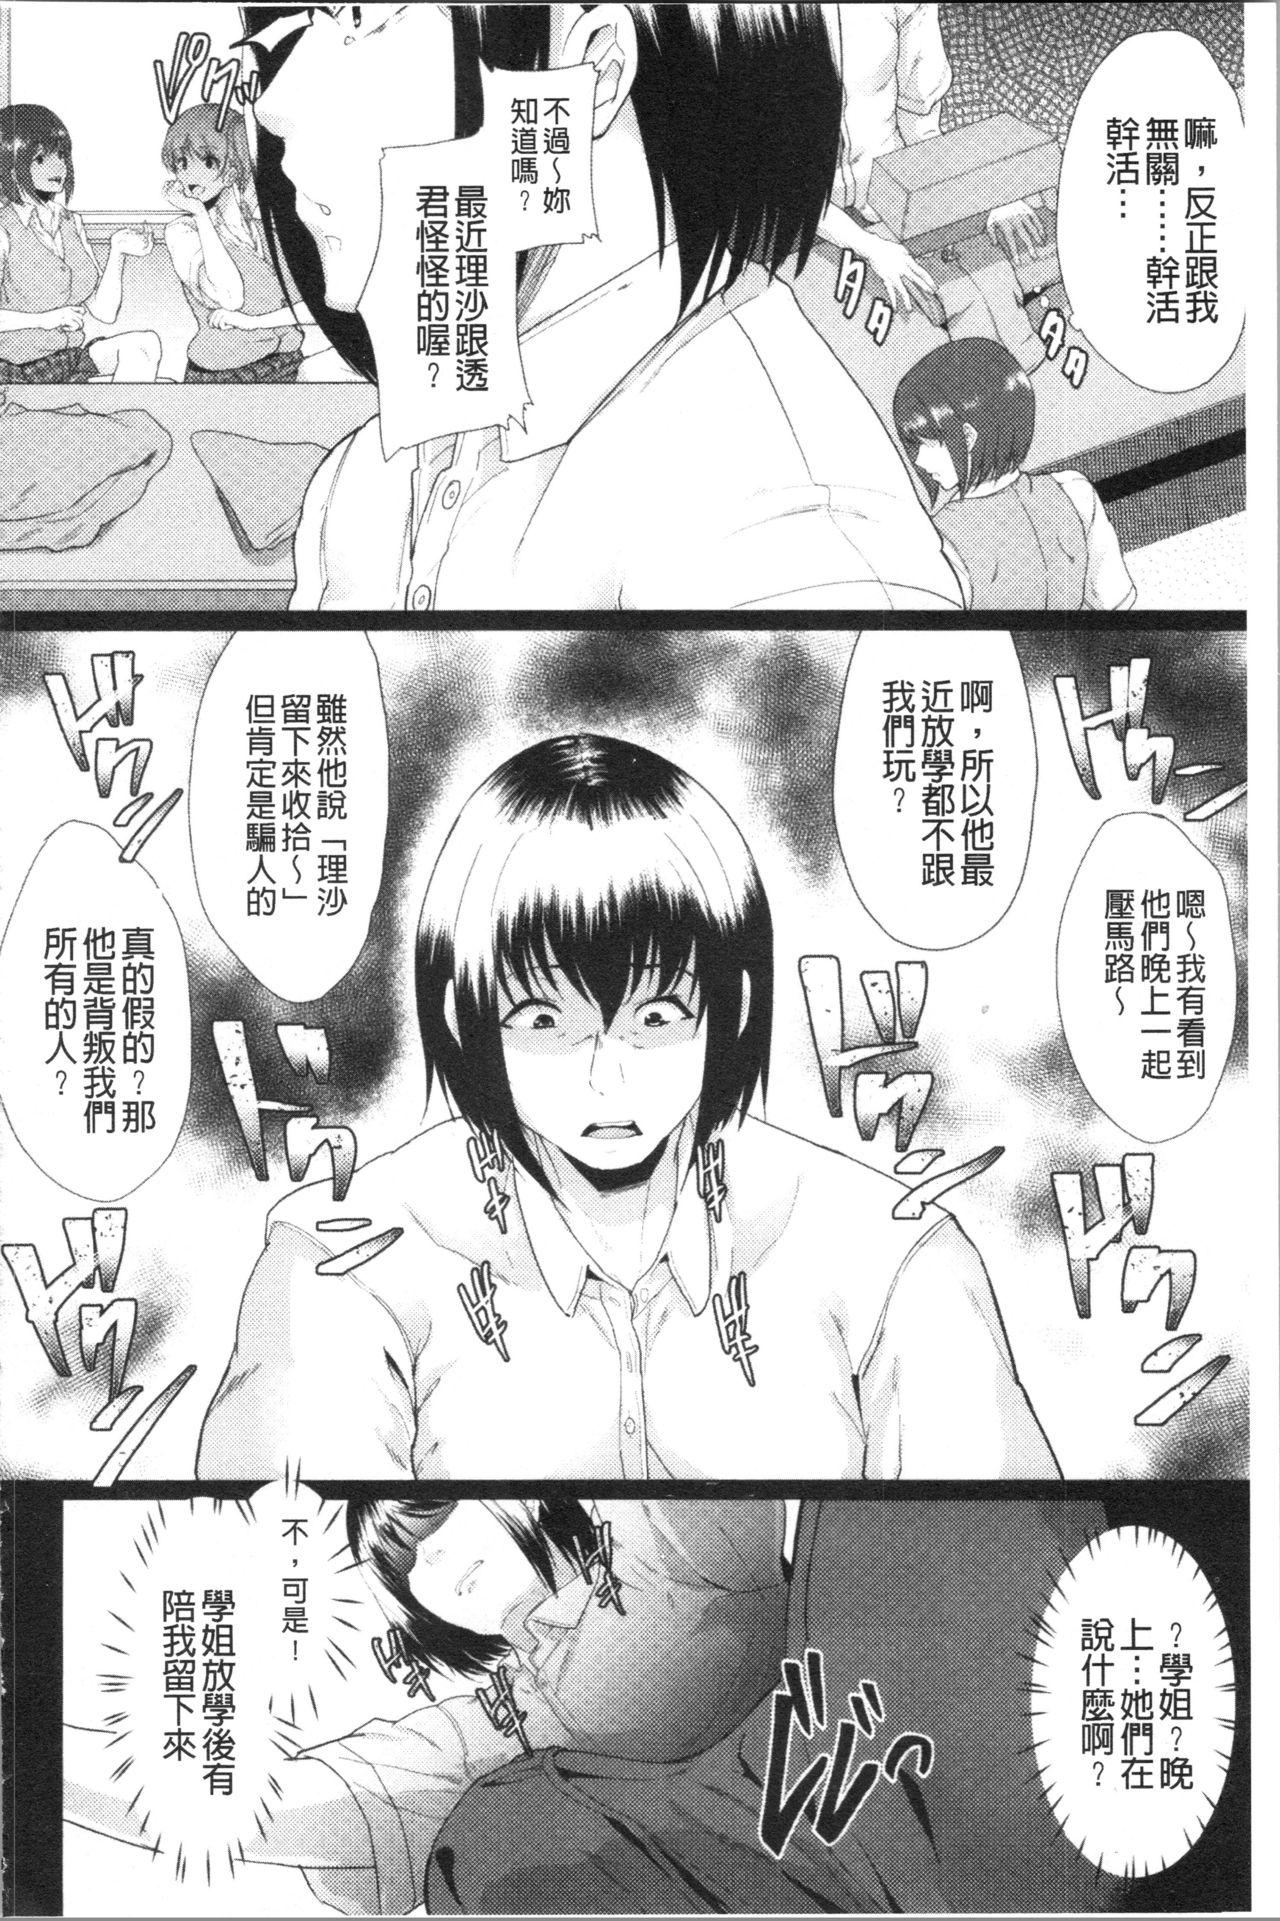 Kanojo ga SEX ni nare teru wake | 女友對激情性愛變很習慣的理由 28